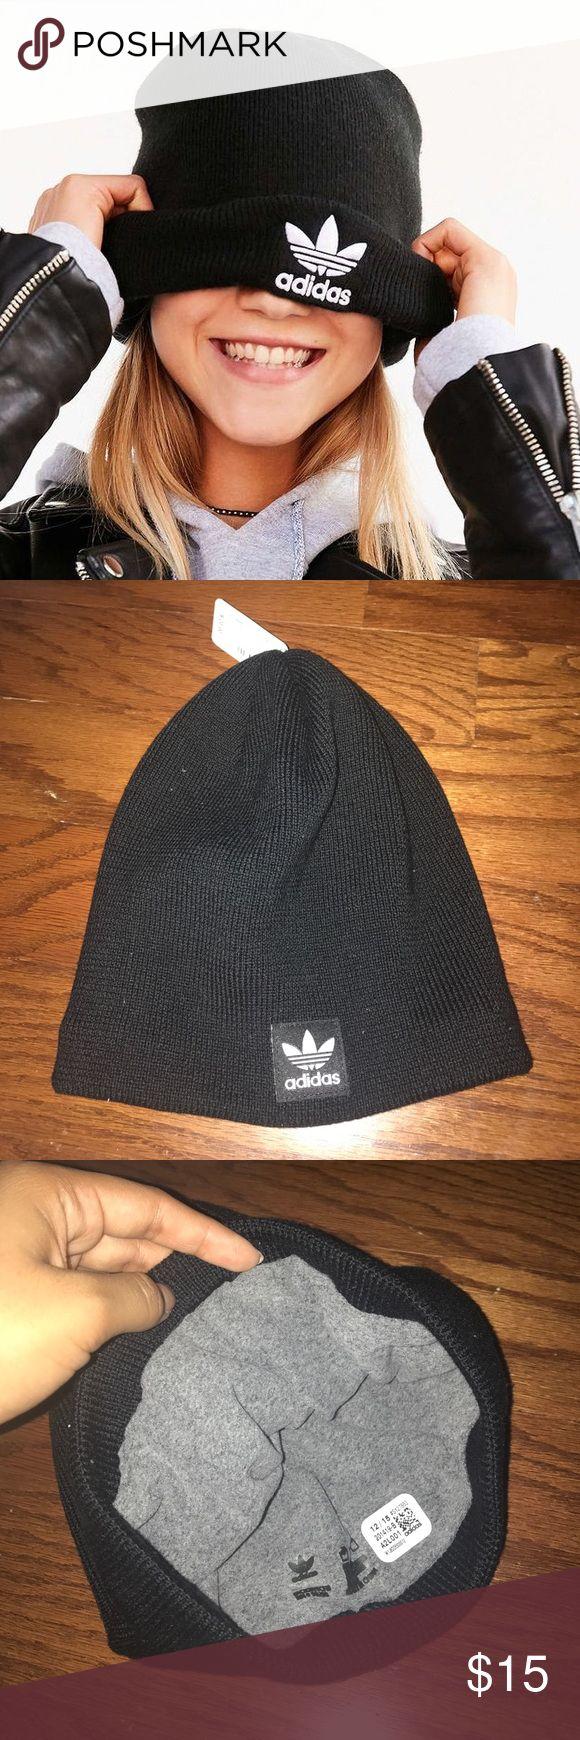 Black Adidas Beanie Brand new adidas beanie!!! Adidas Accessories Hats